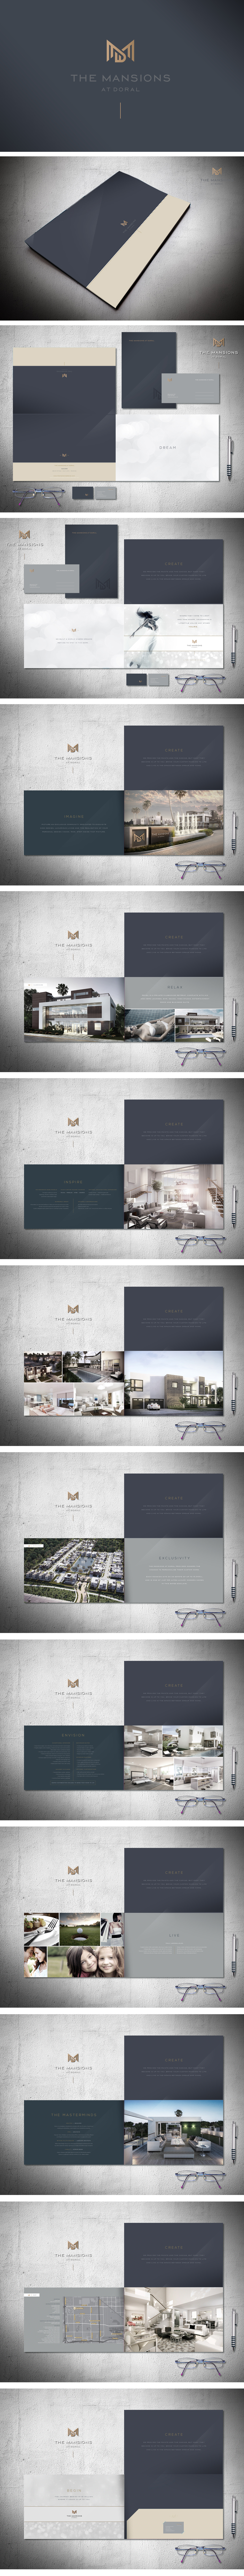 TheMansions_brochure.jpg